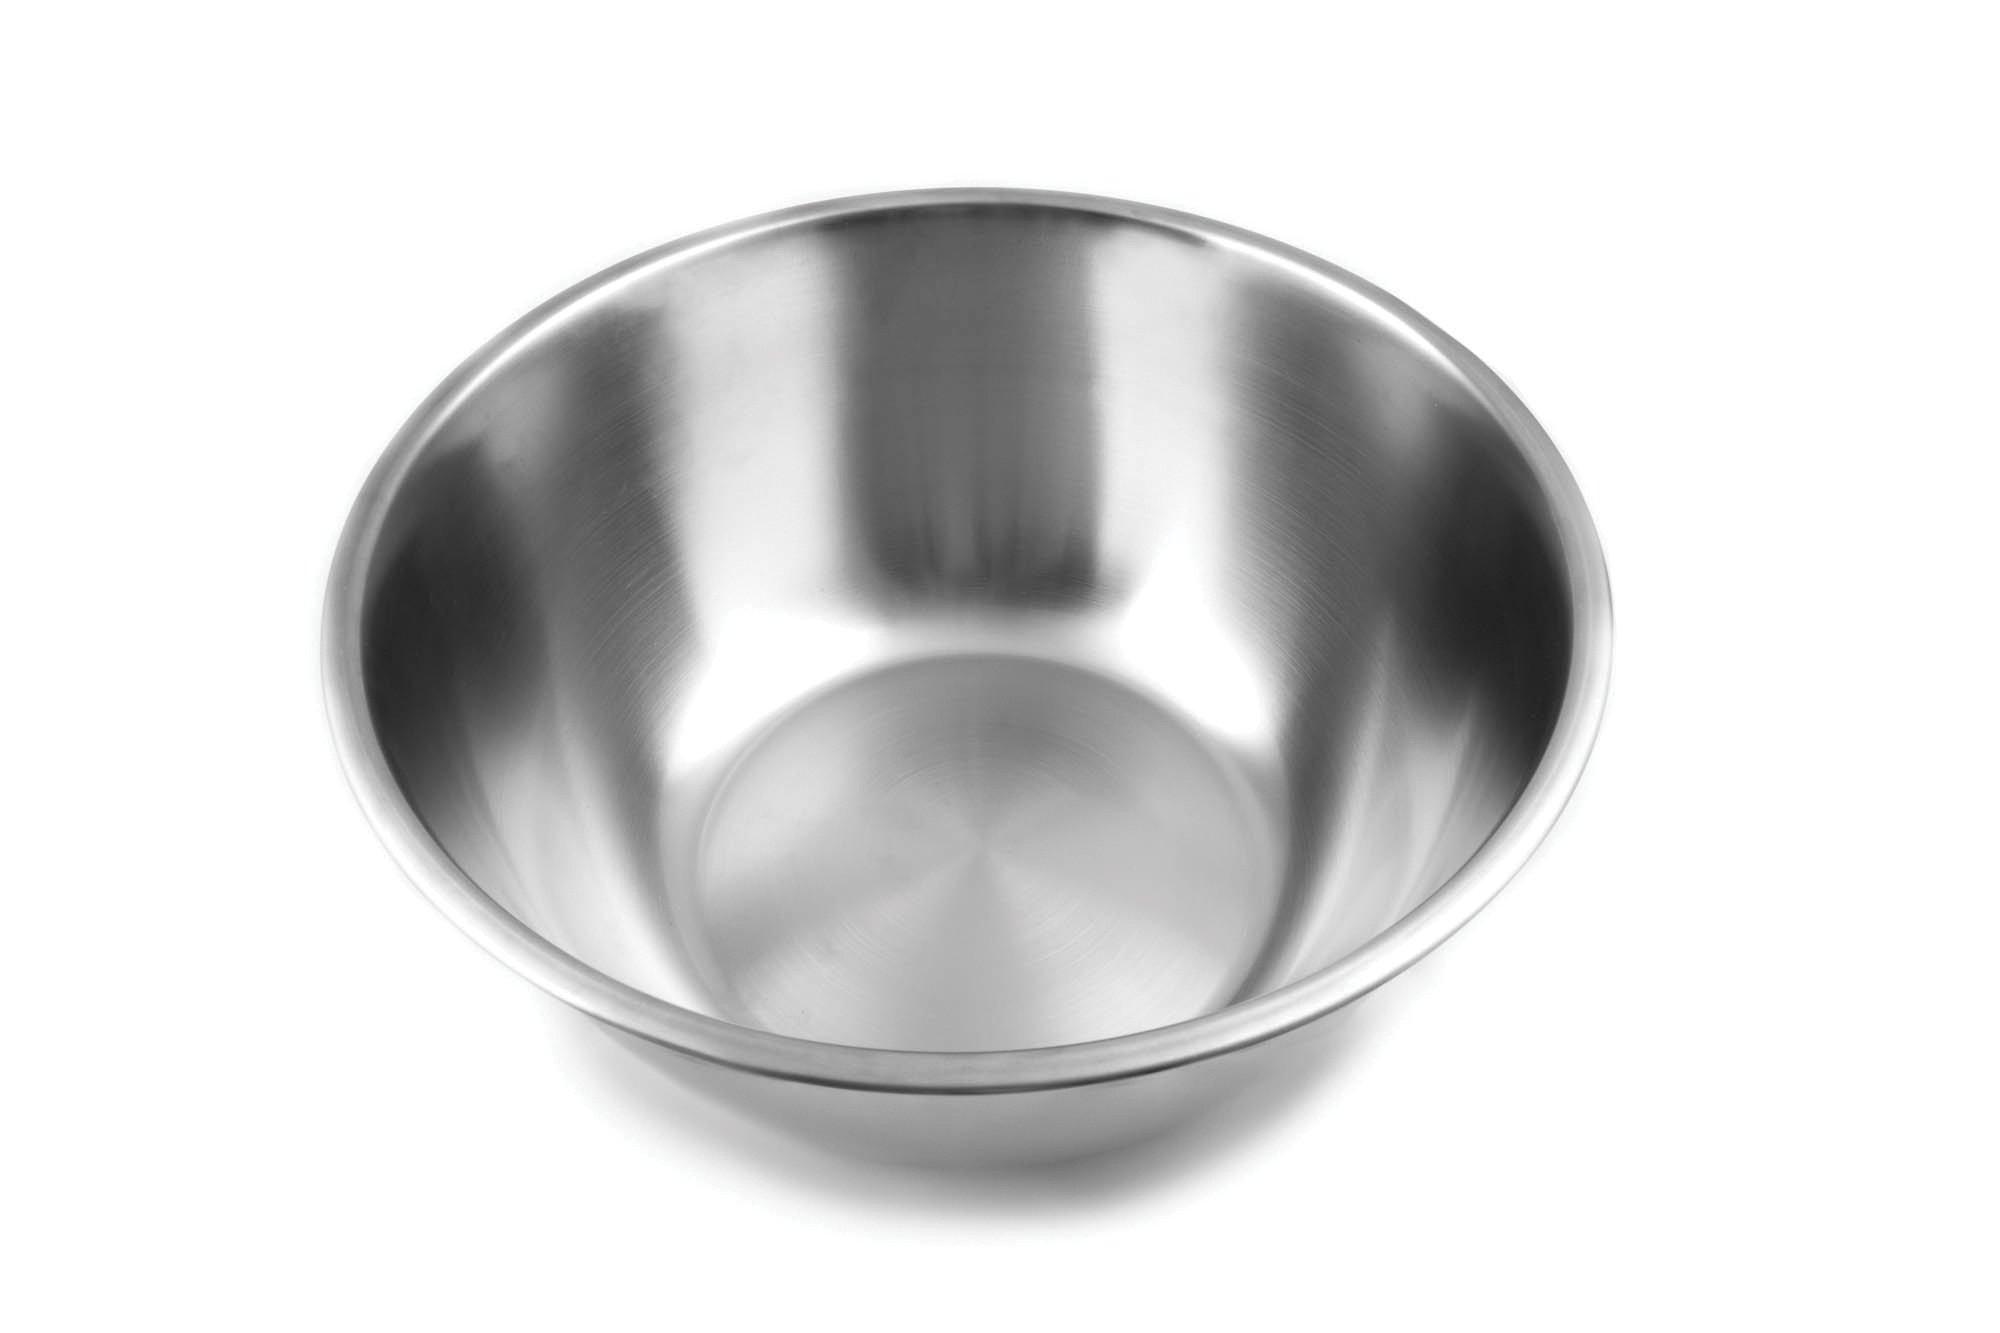 Fox Run 7330, Large Mixing Bowl, 10.75-Quart,Stainless Steel